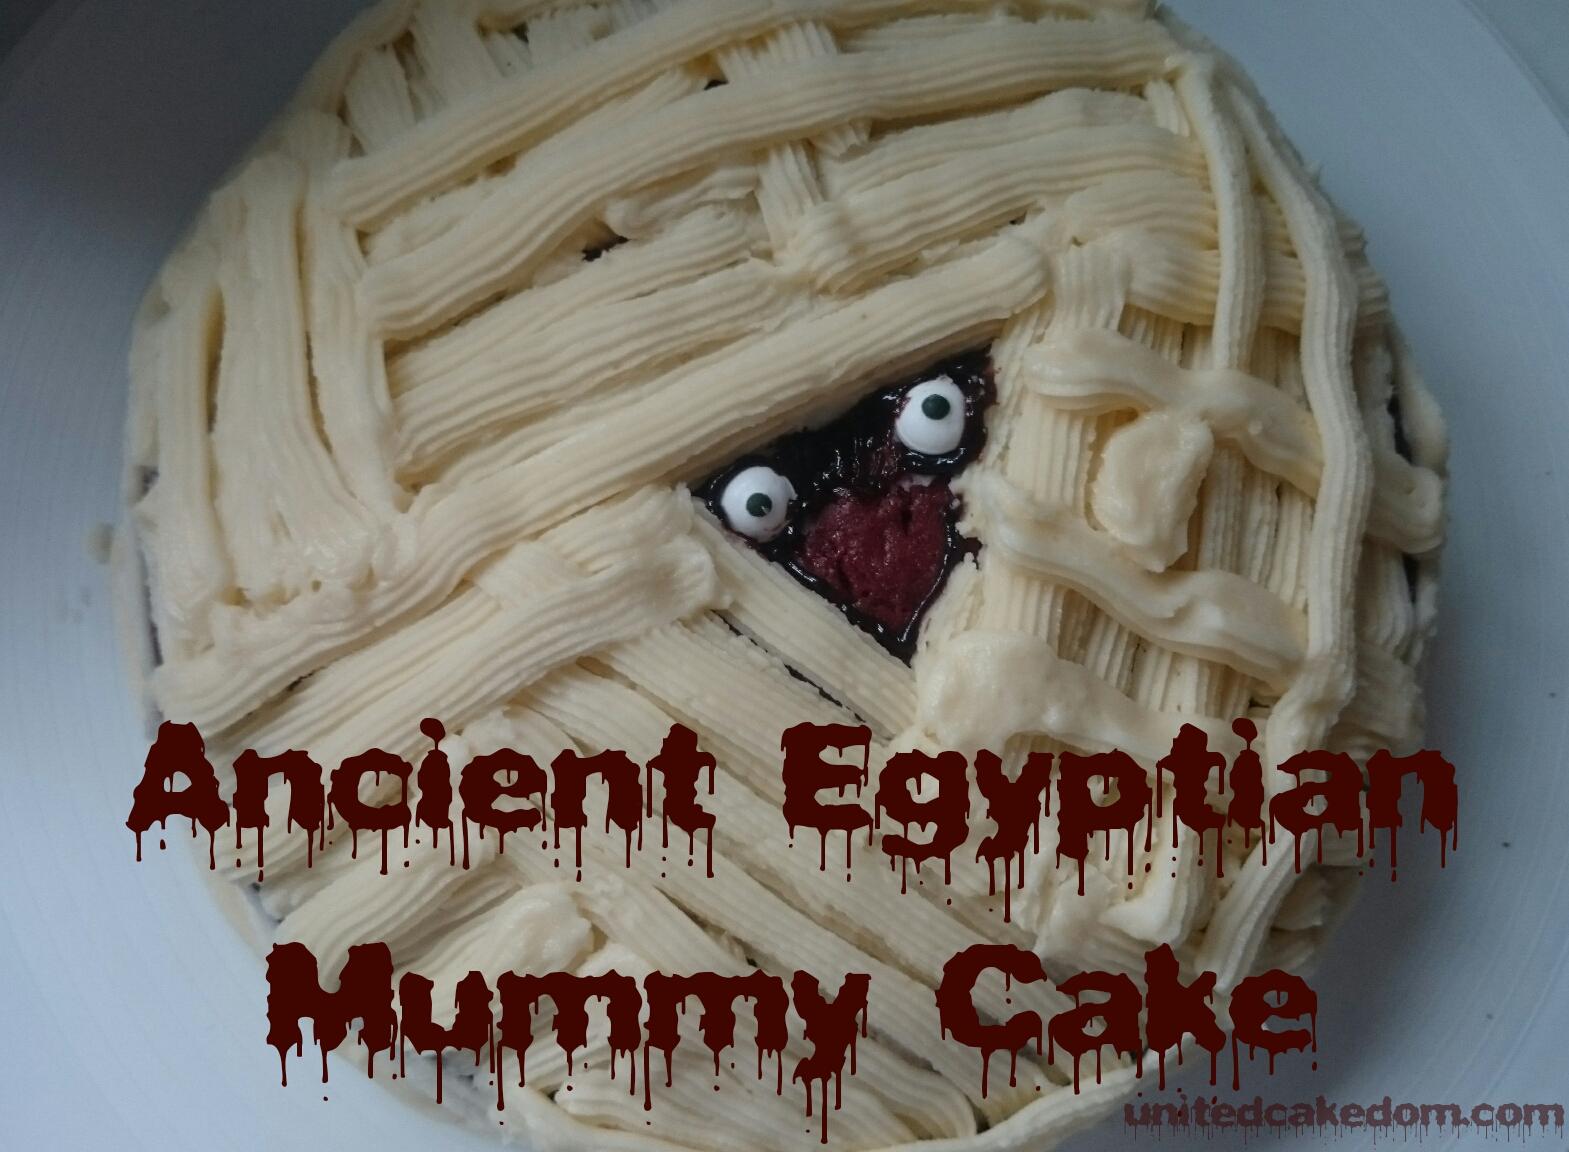 Enjoyable United Cakedom Red Velvet Ancient Egyptian Mummy Cake Halloween Funny Birthday Cards Online Necthendildamsfinfo